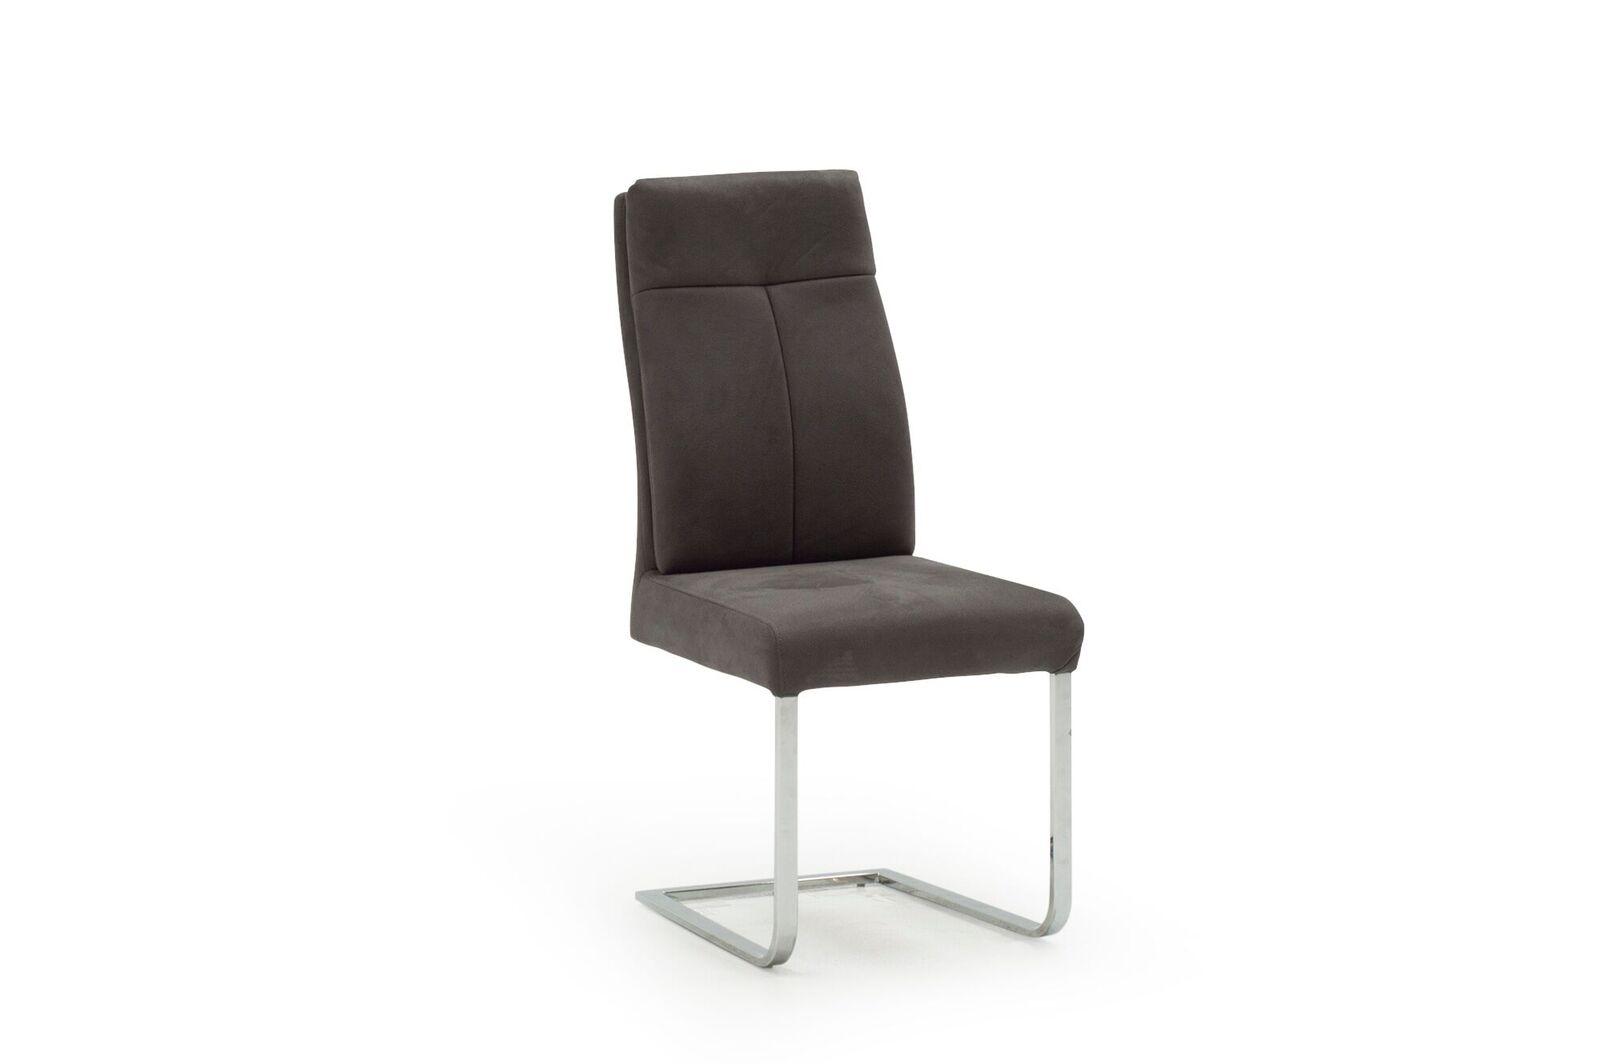 Scaun tapitat cu stofa cu picioare metalice Donatella Grey l63xA445xH104 cm